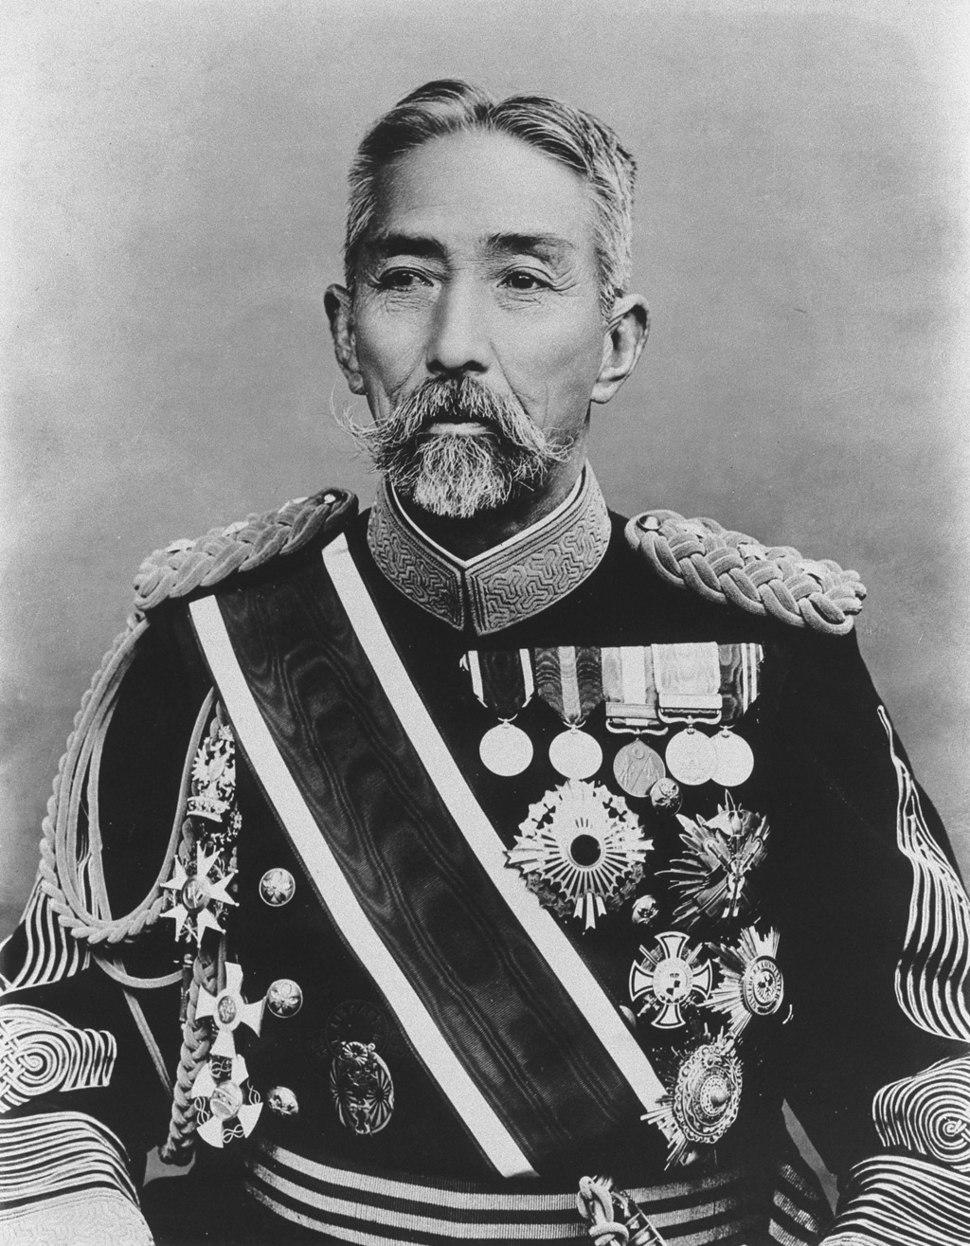 Nozu Michitsura